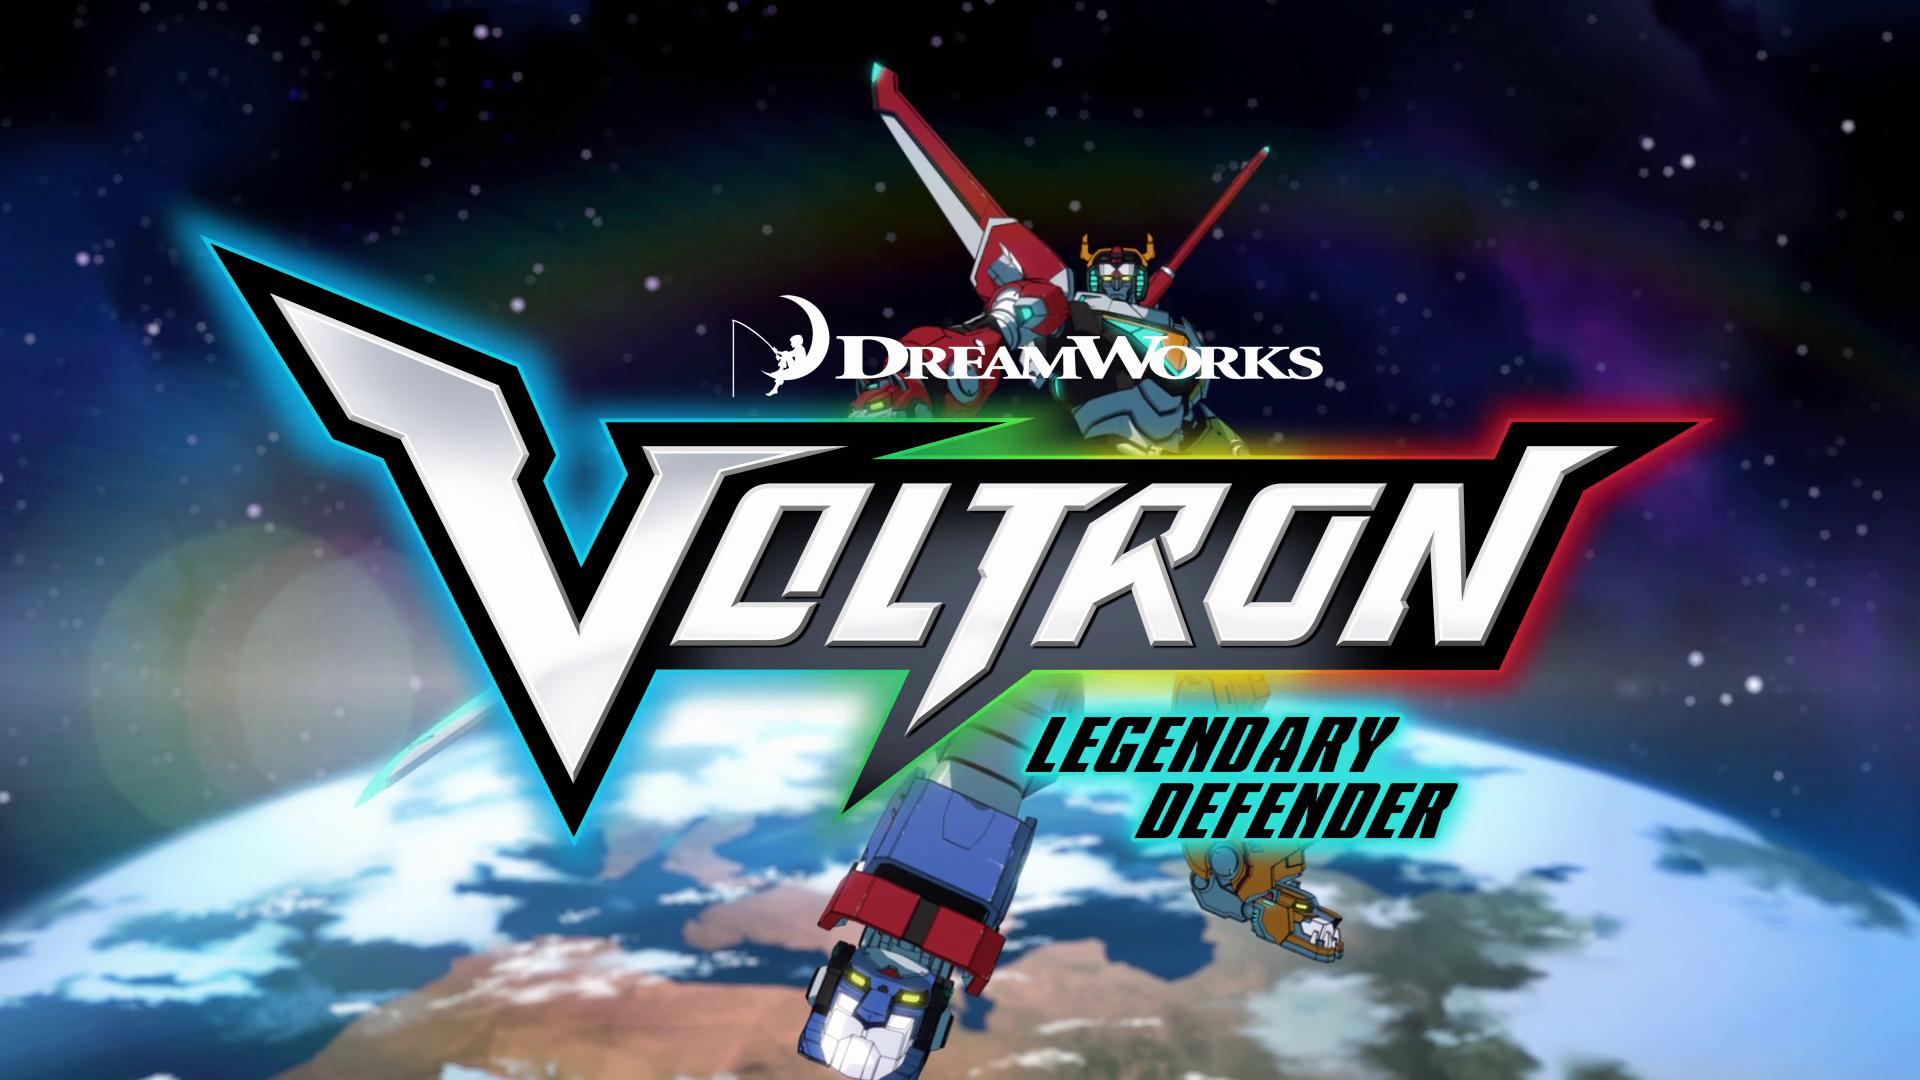 Voltron Legendary Defender S07E10 1080p WEB x264-STRiFE